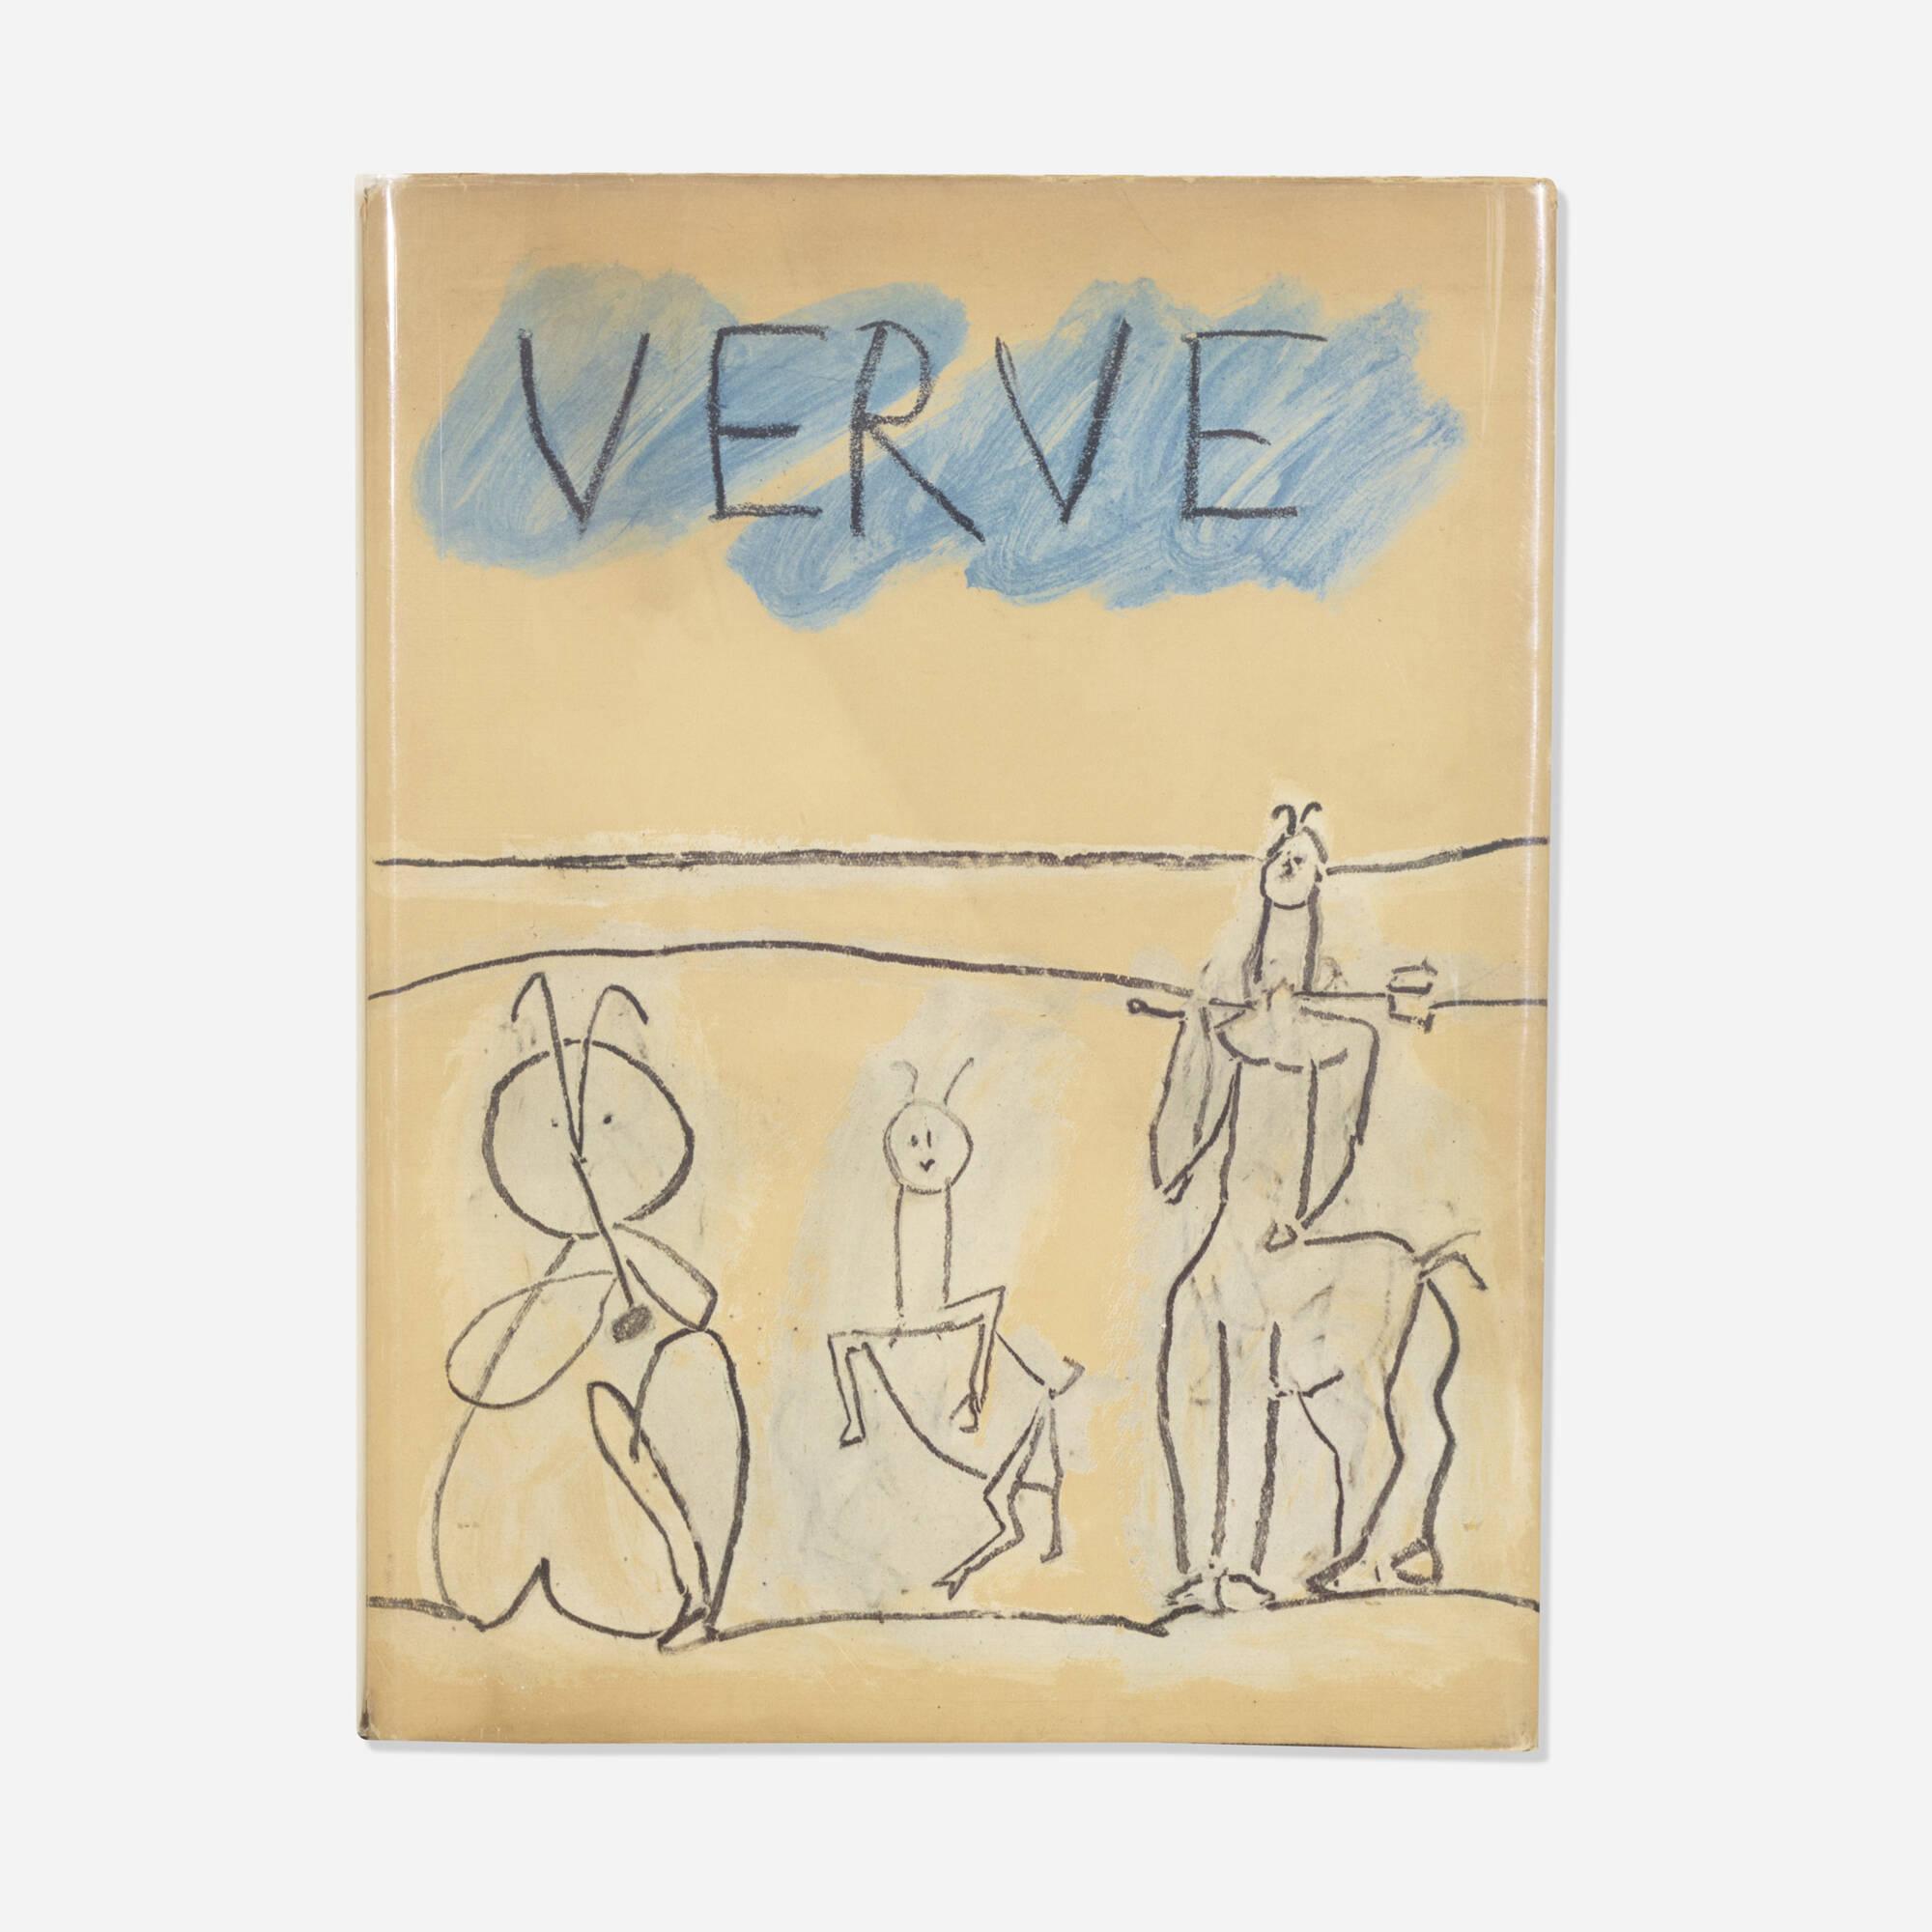 157: Various Artists / Portfolio Revue Verve (2 of 5)